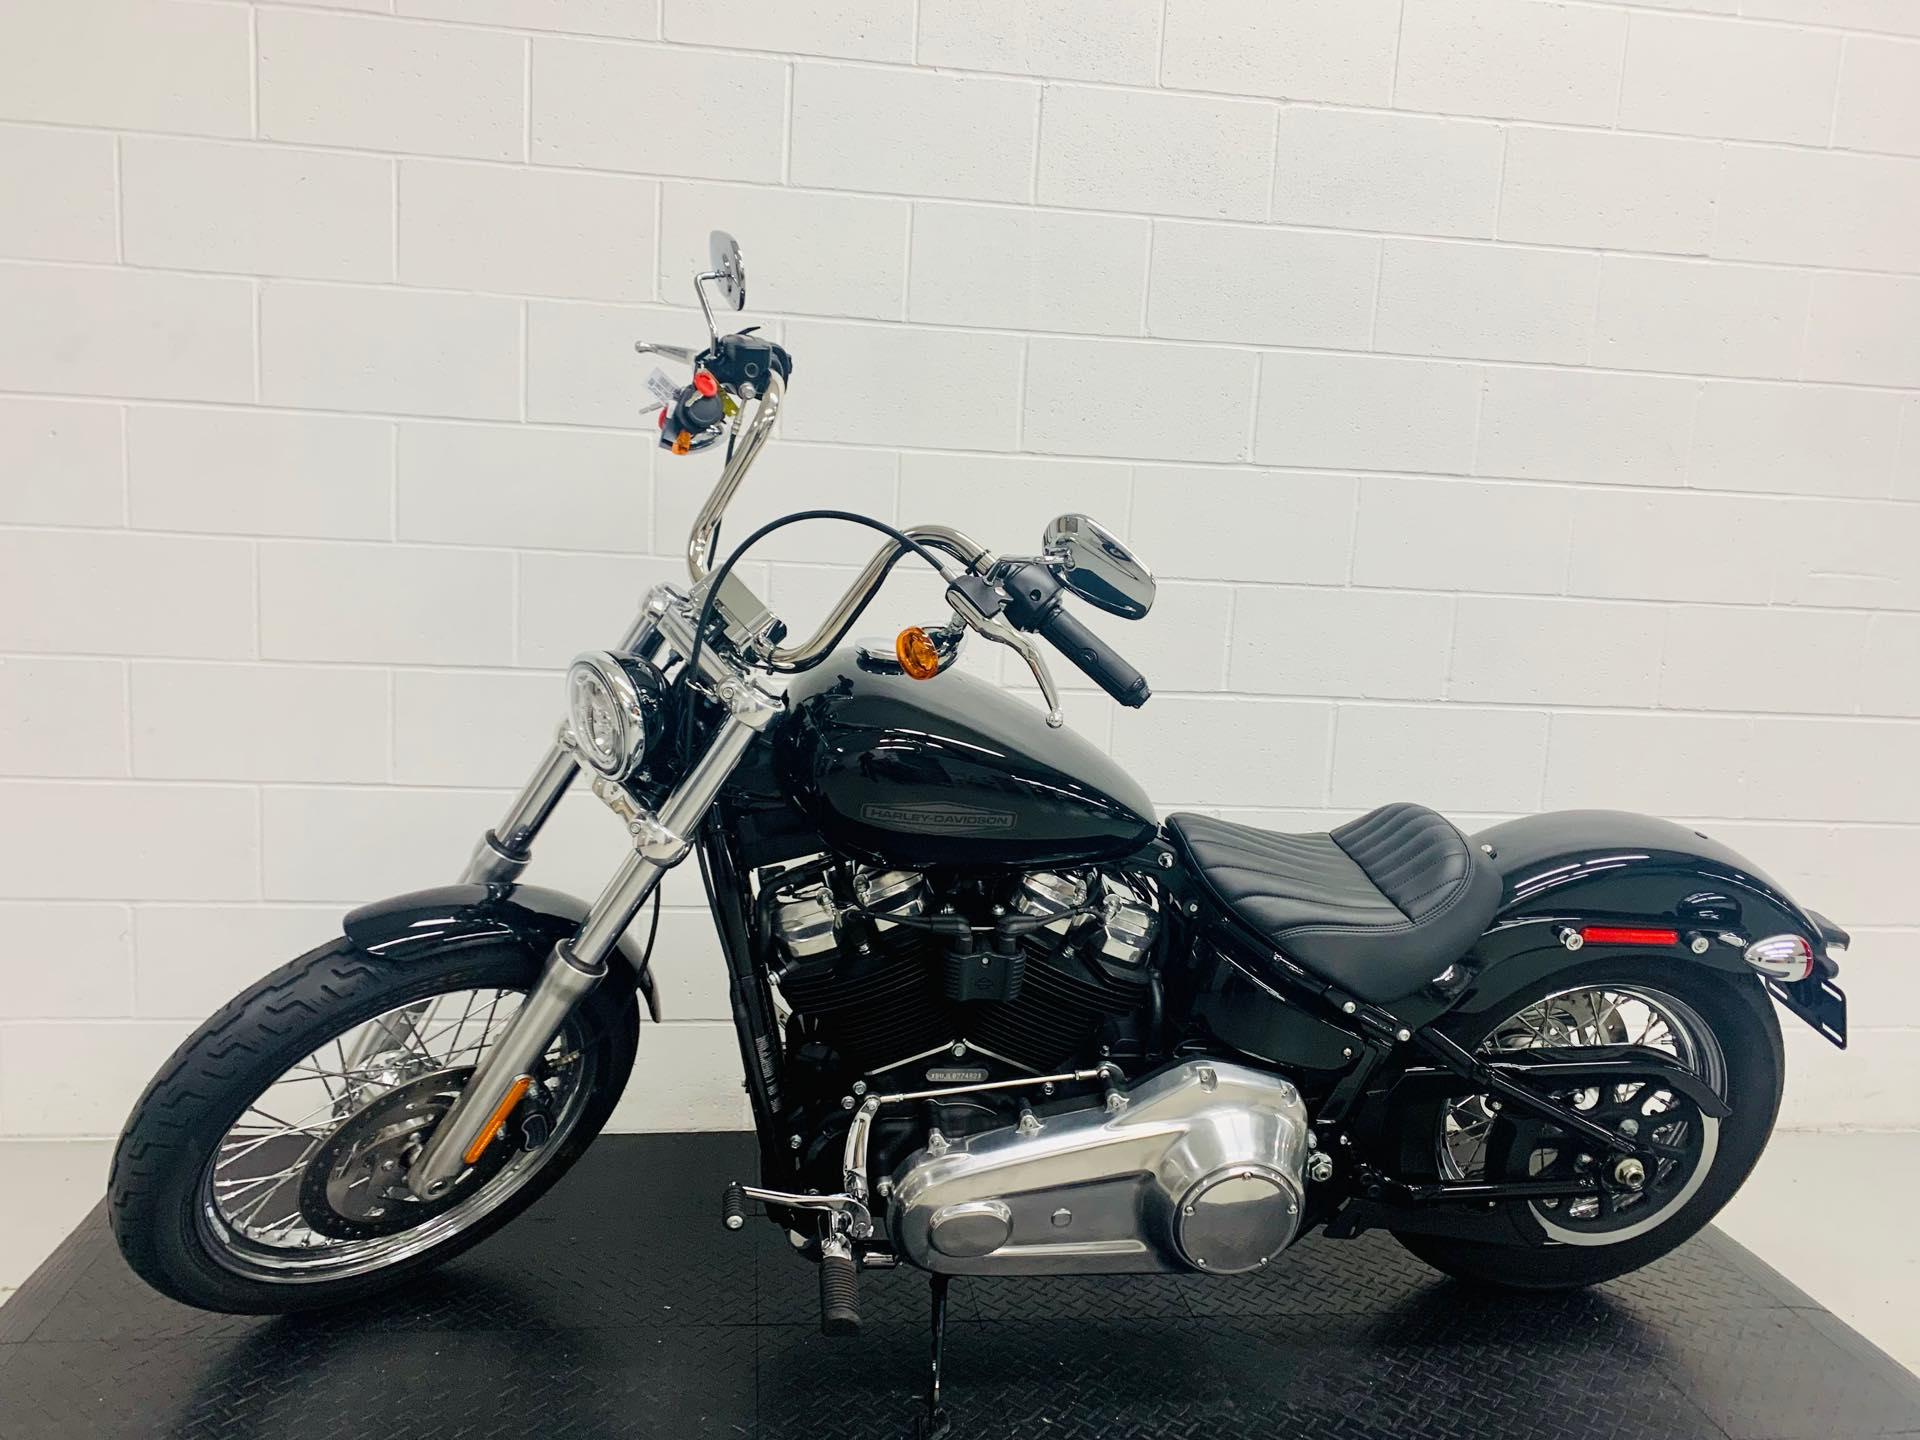 2020 Harley-Davidson Softail Standard at Destination Harley-Davidson®, Silverdale, WA 98383